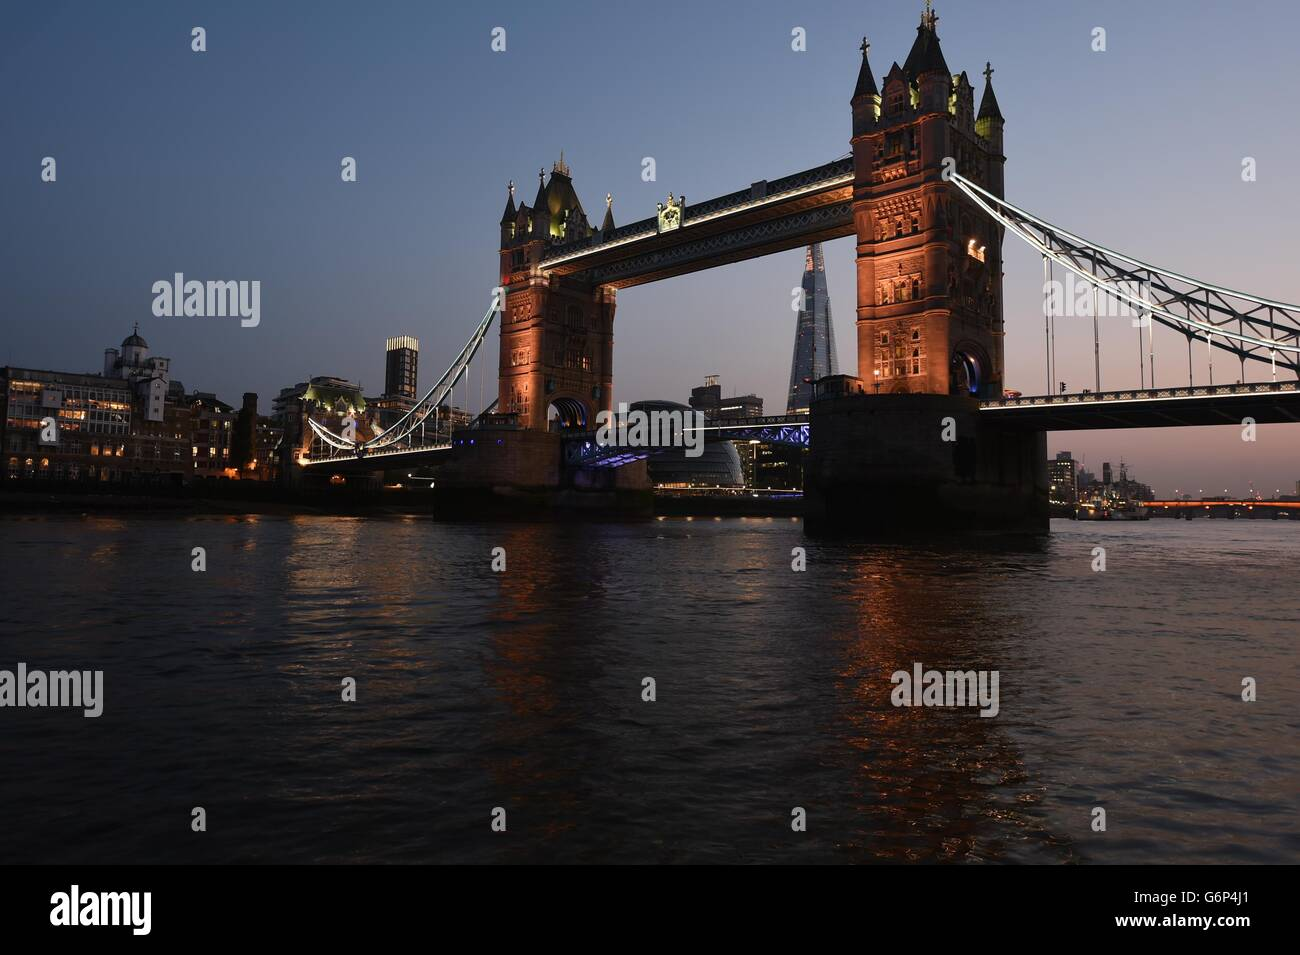 Tower bridge, River Thames, bridge, london, UK - Stock Image